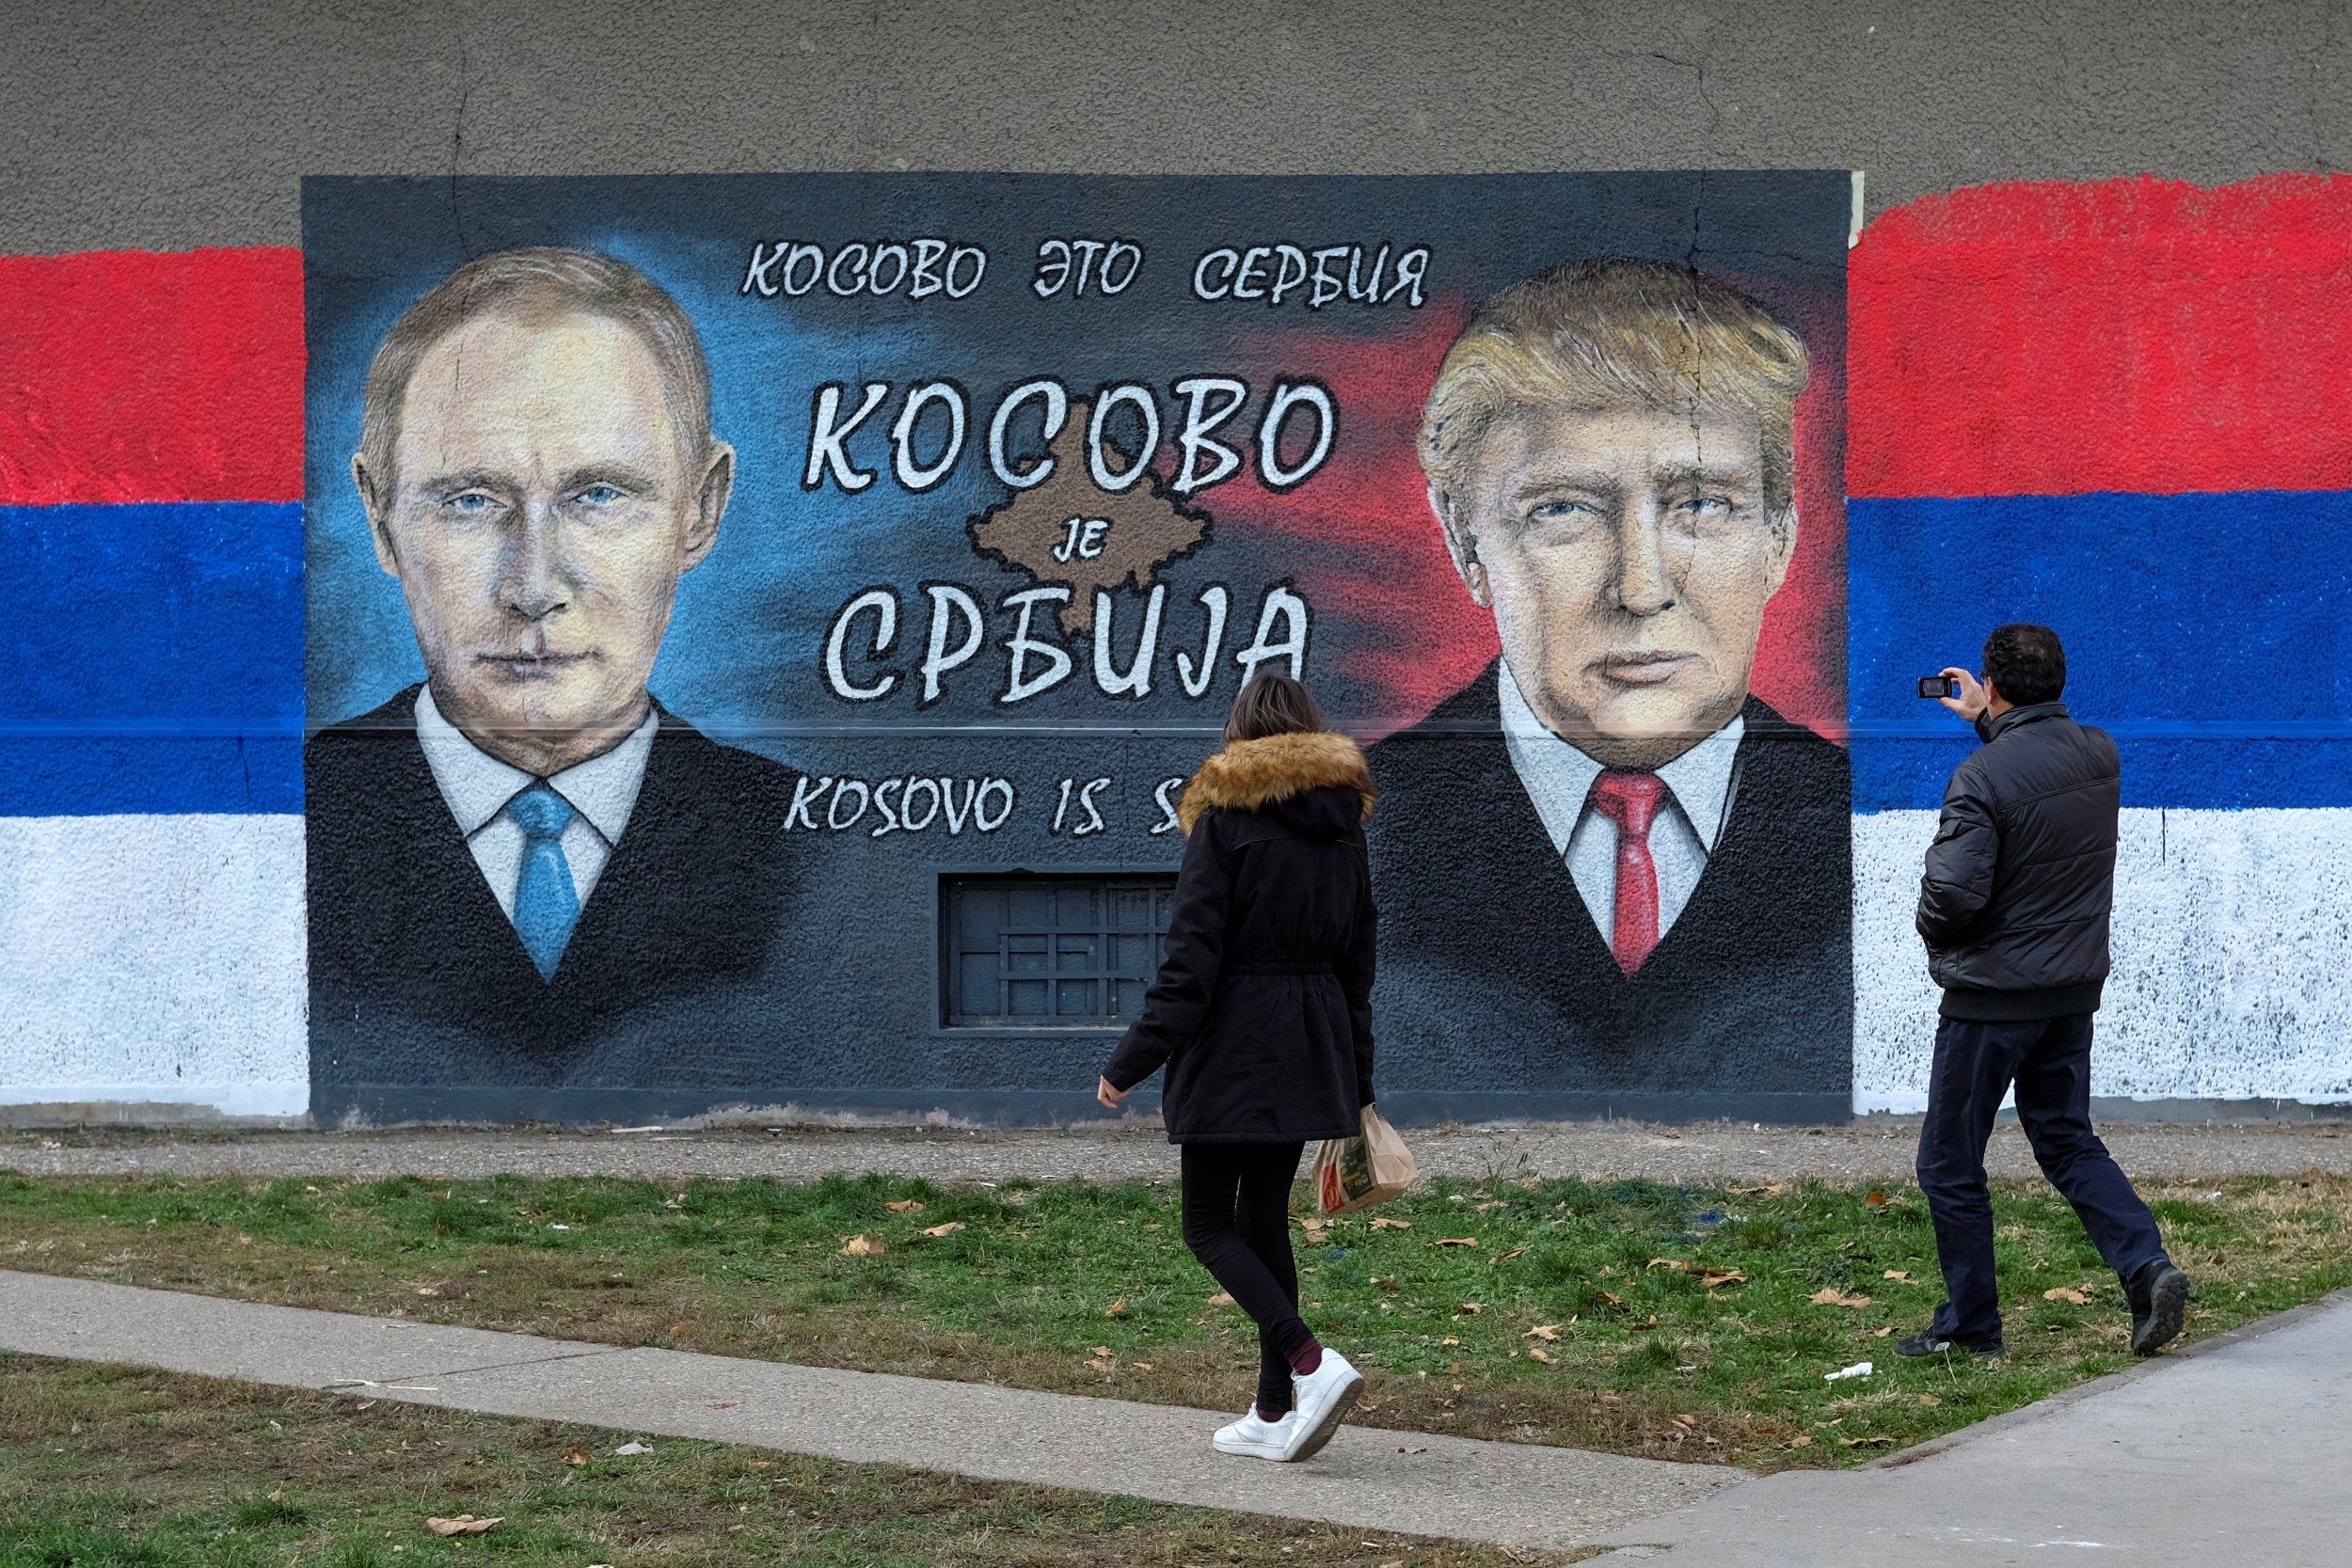 12_15_Russia_Hack_01